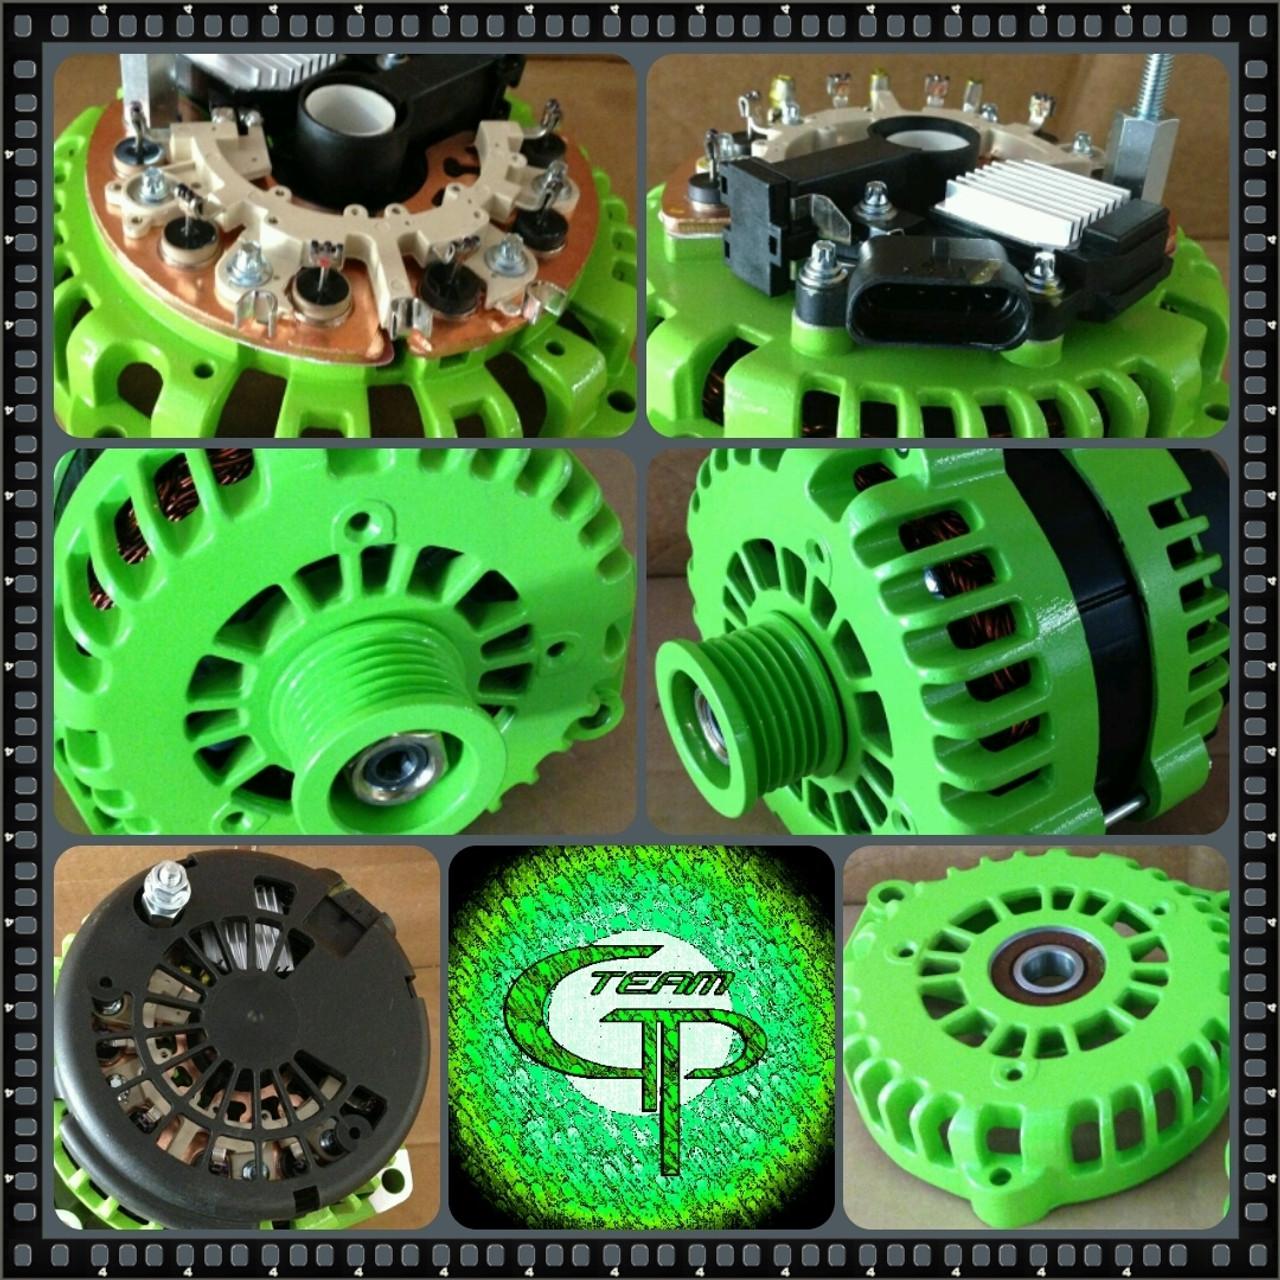 CHEVROLET CRUZE 1.4L  -2011-2014- 320 AMP TEAM GP Alternator